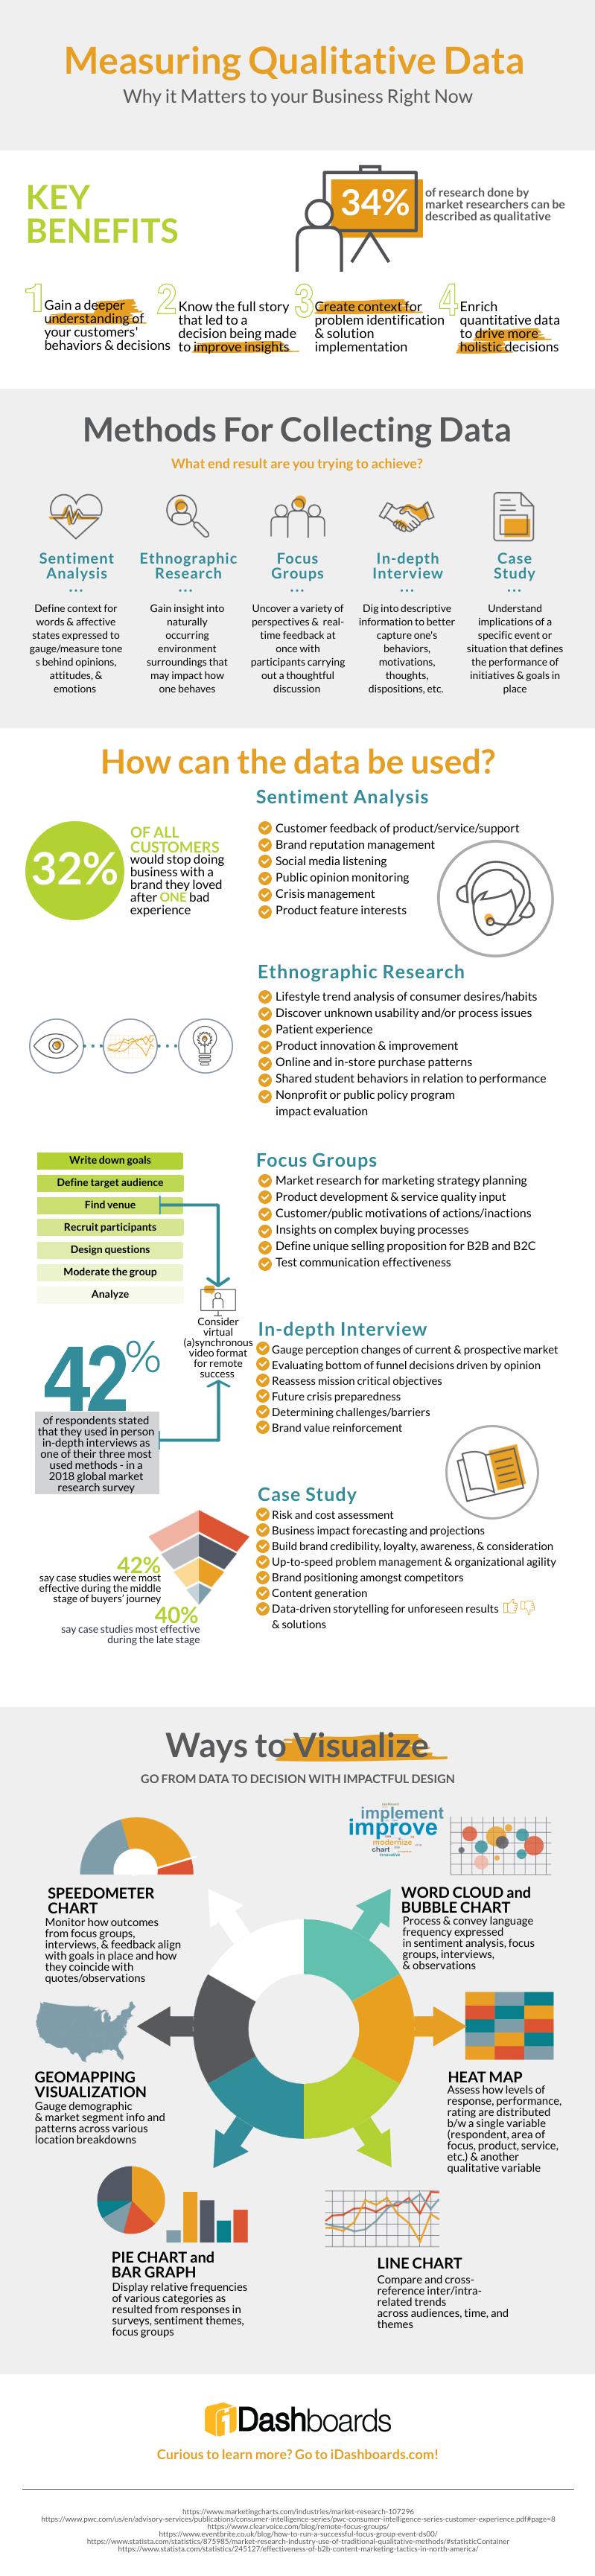 Measuring Qualitative Data #infographic #Business #Data